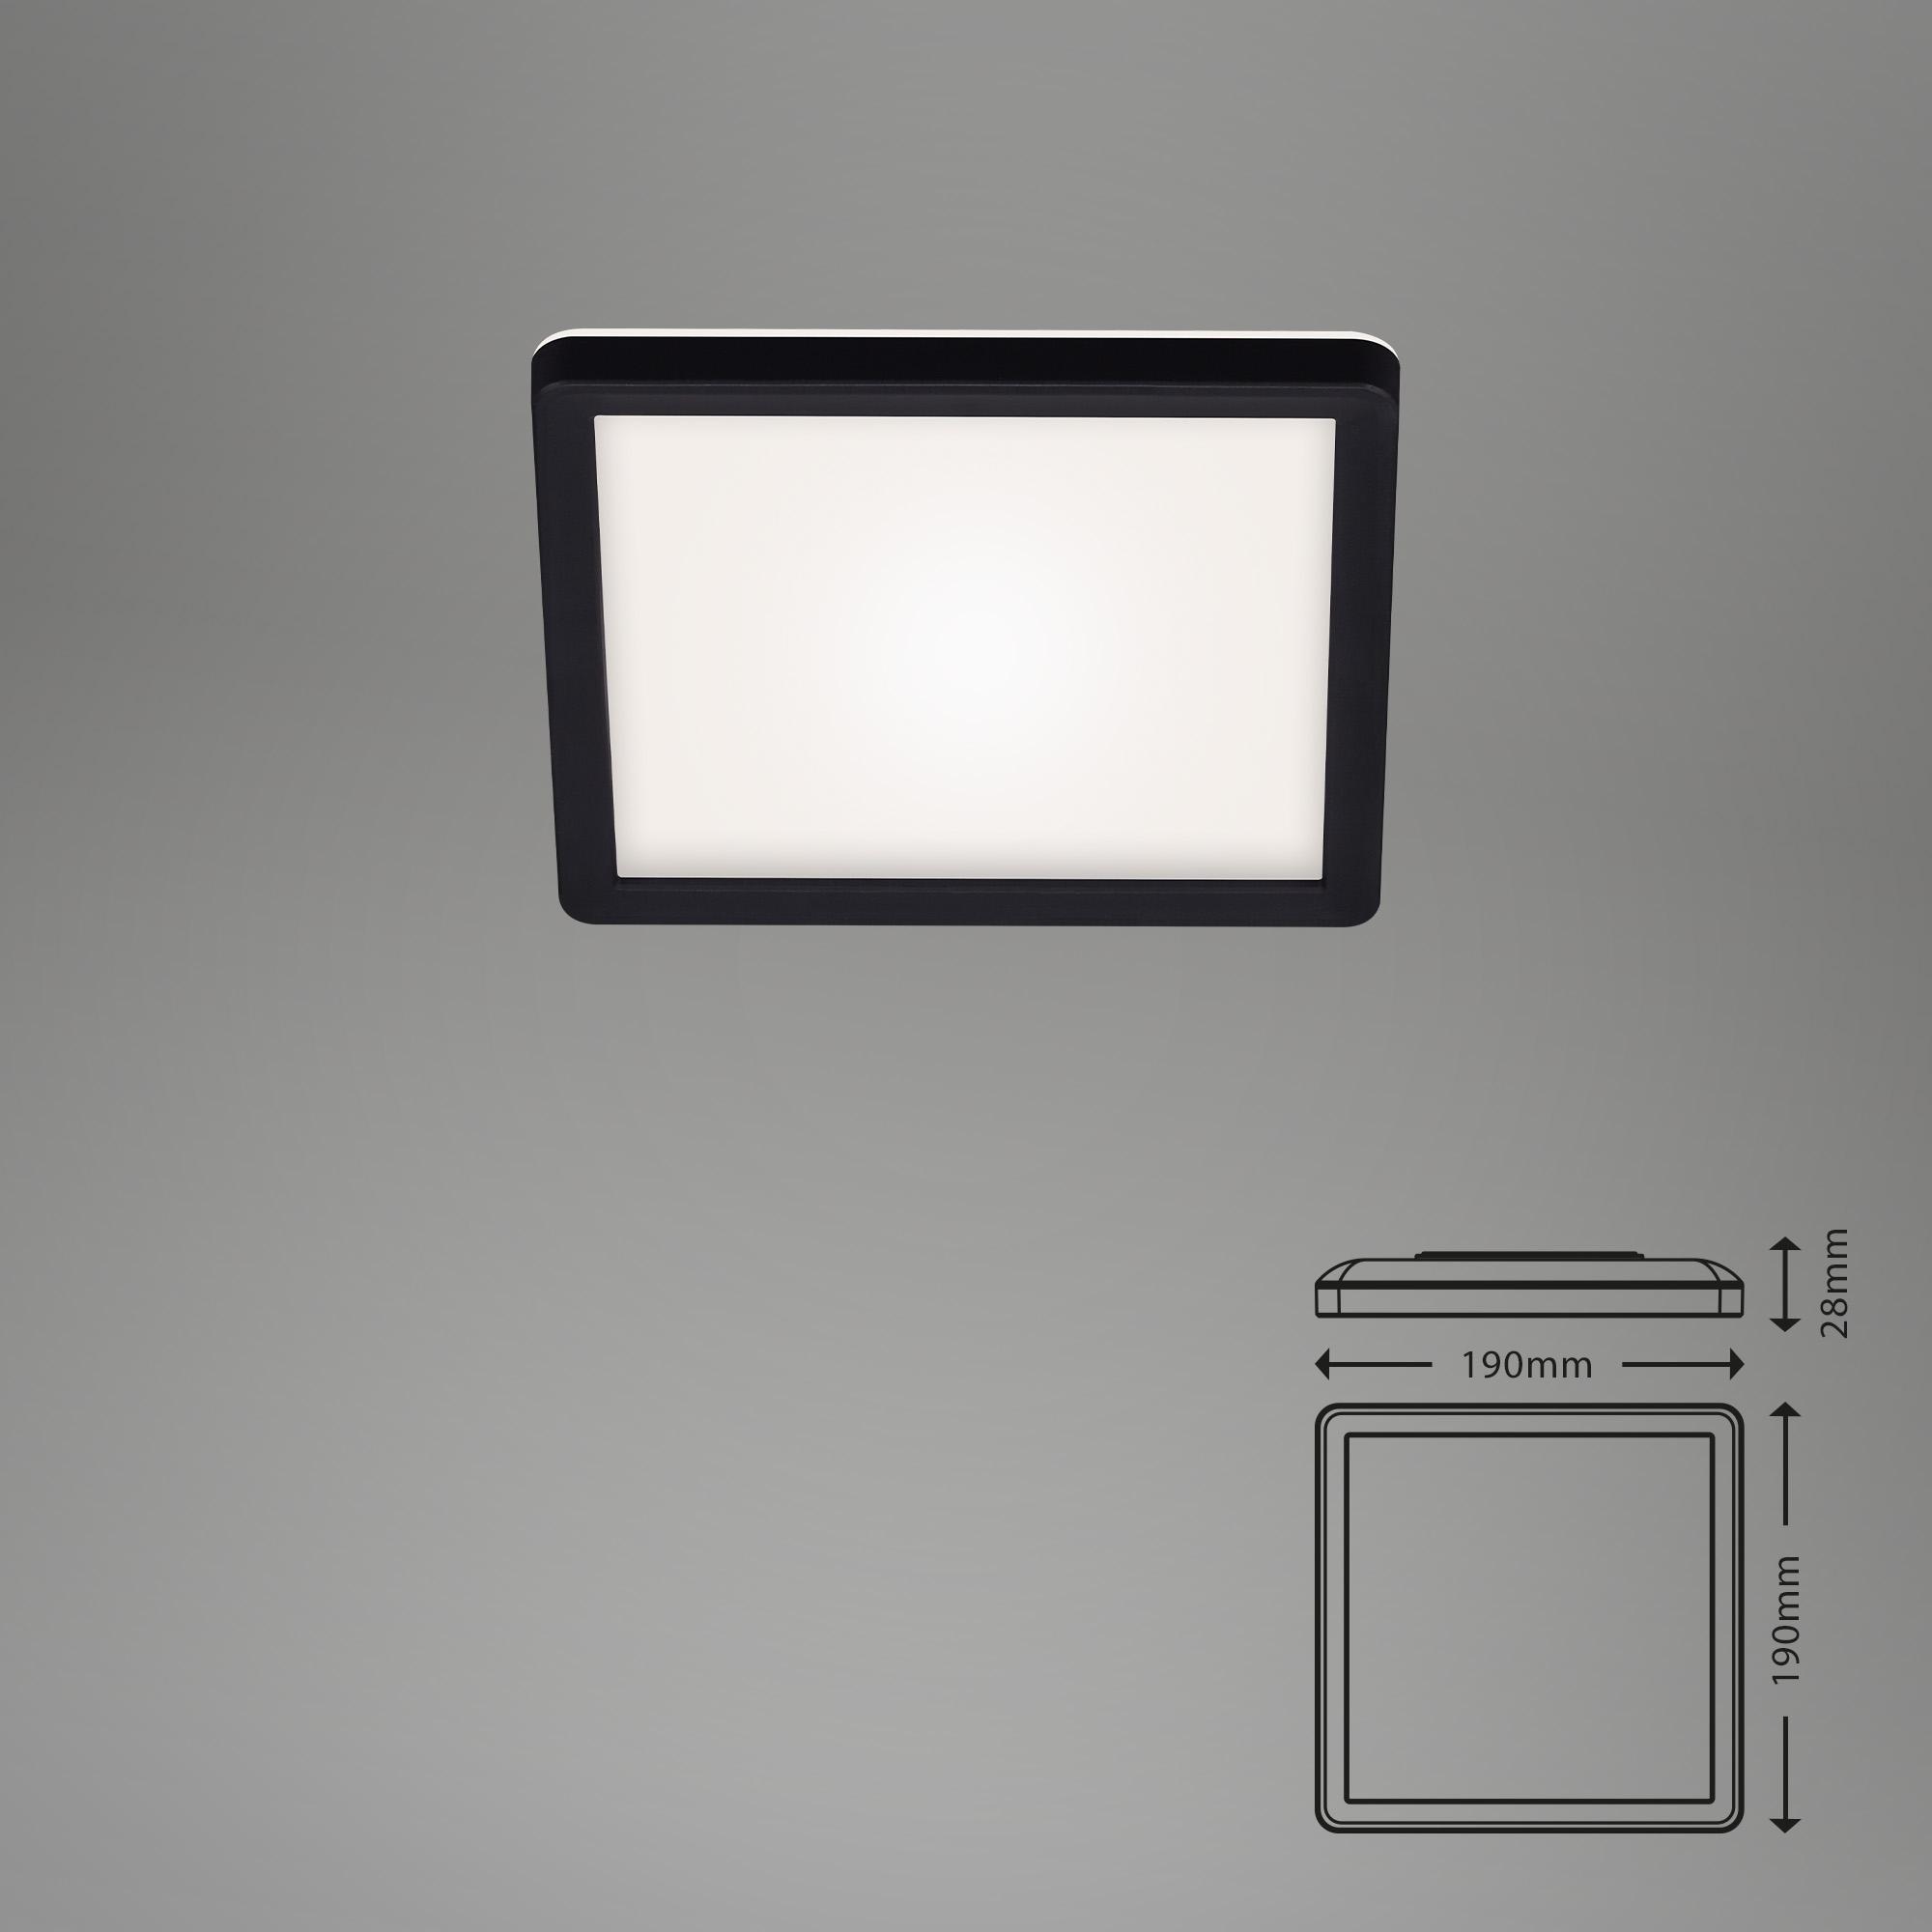 SLIM LED Panel, 19 cm, 12 W, Schwarz